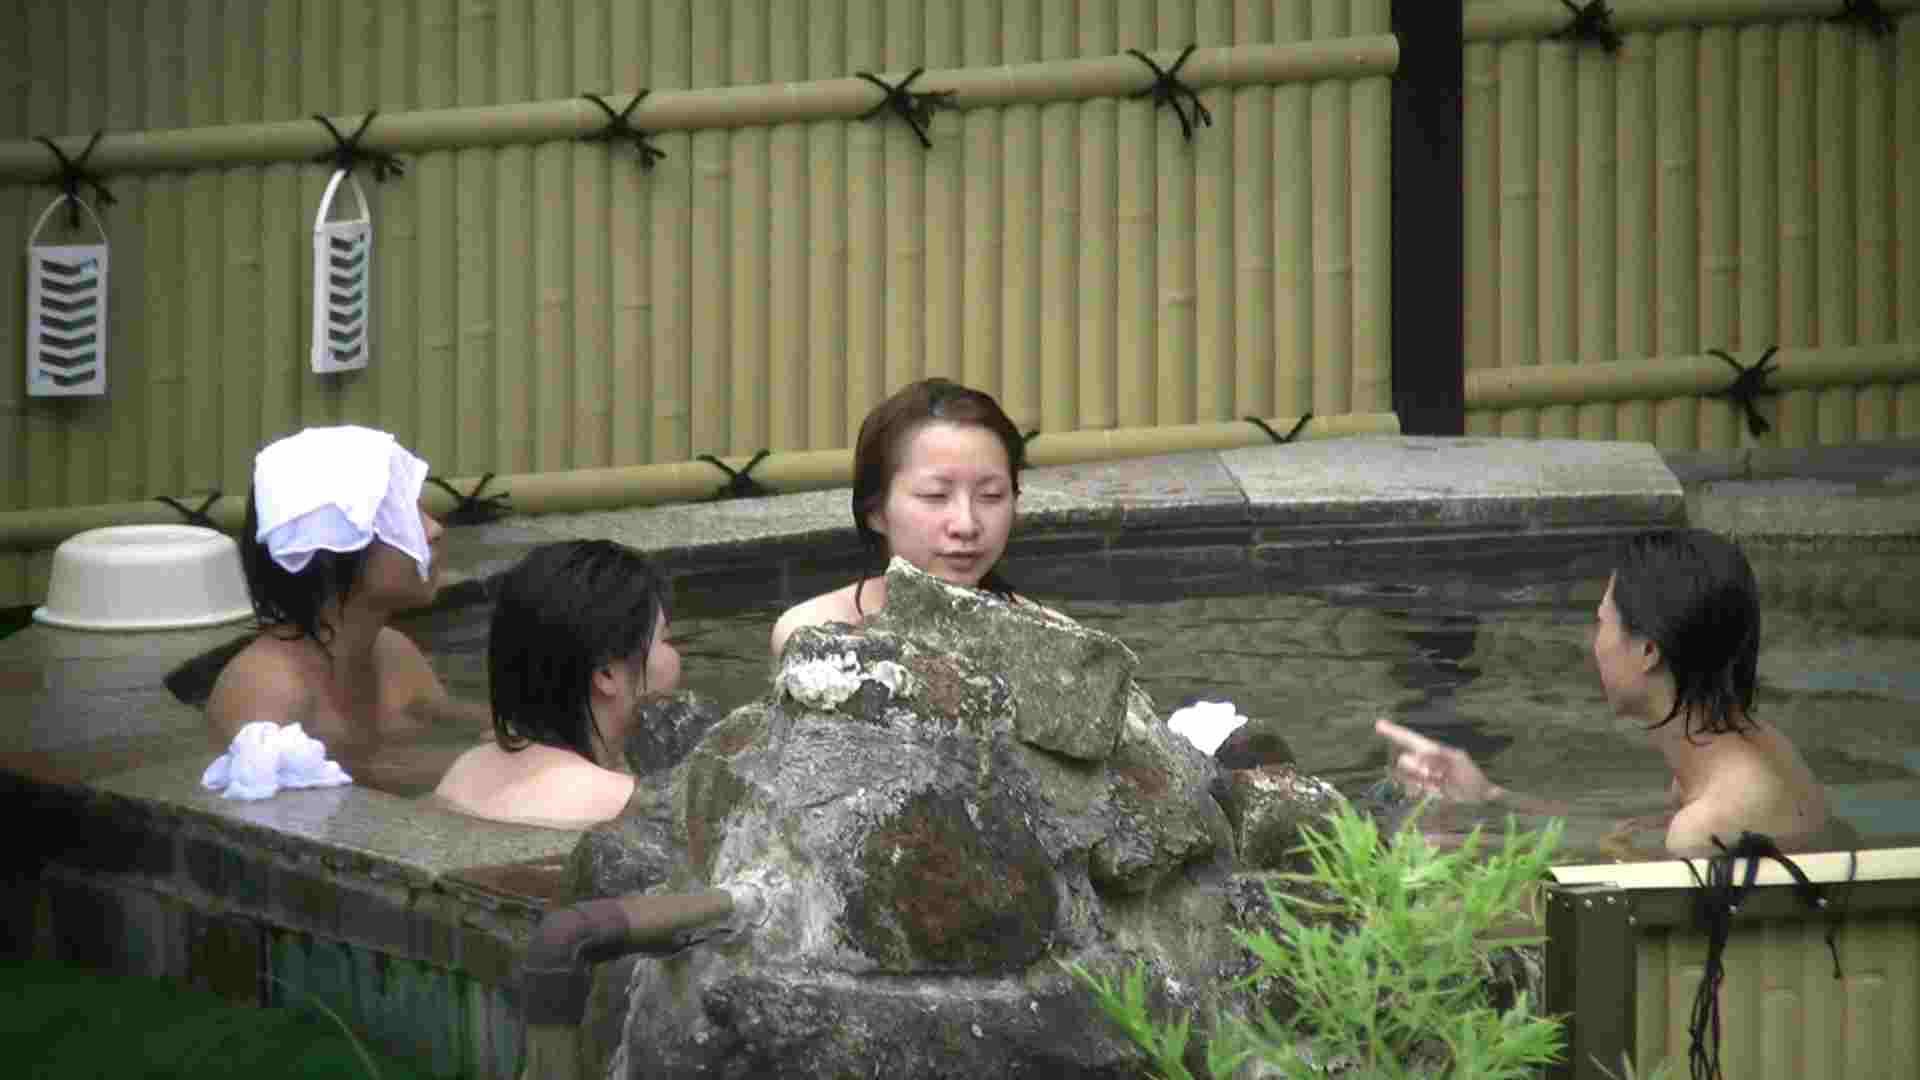 Aquaな露天風呂Vol.181 OLのエロ生活 | 露天風呂  40連発 10